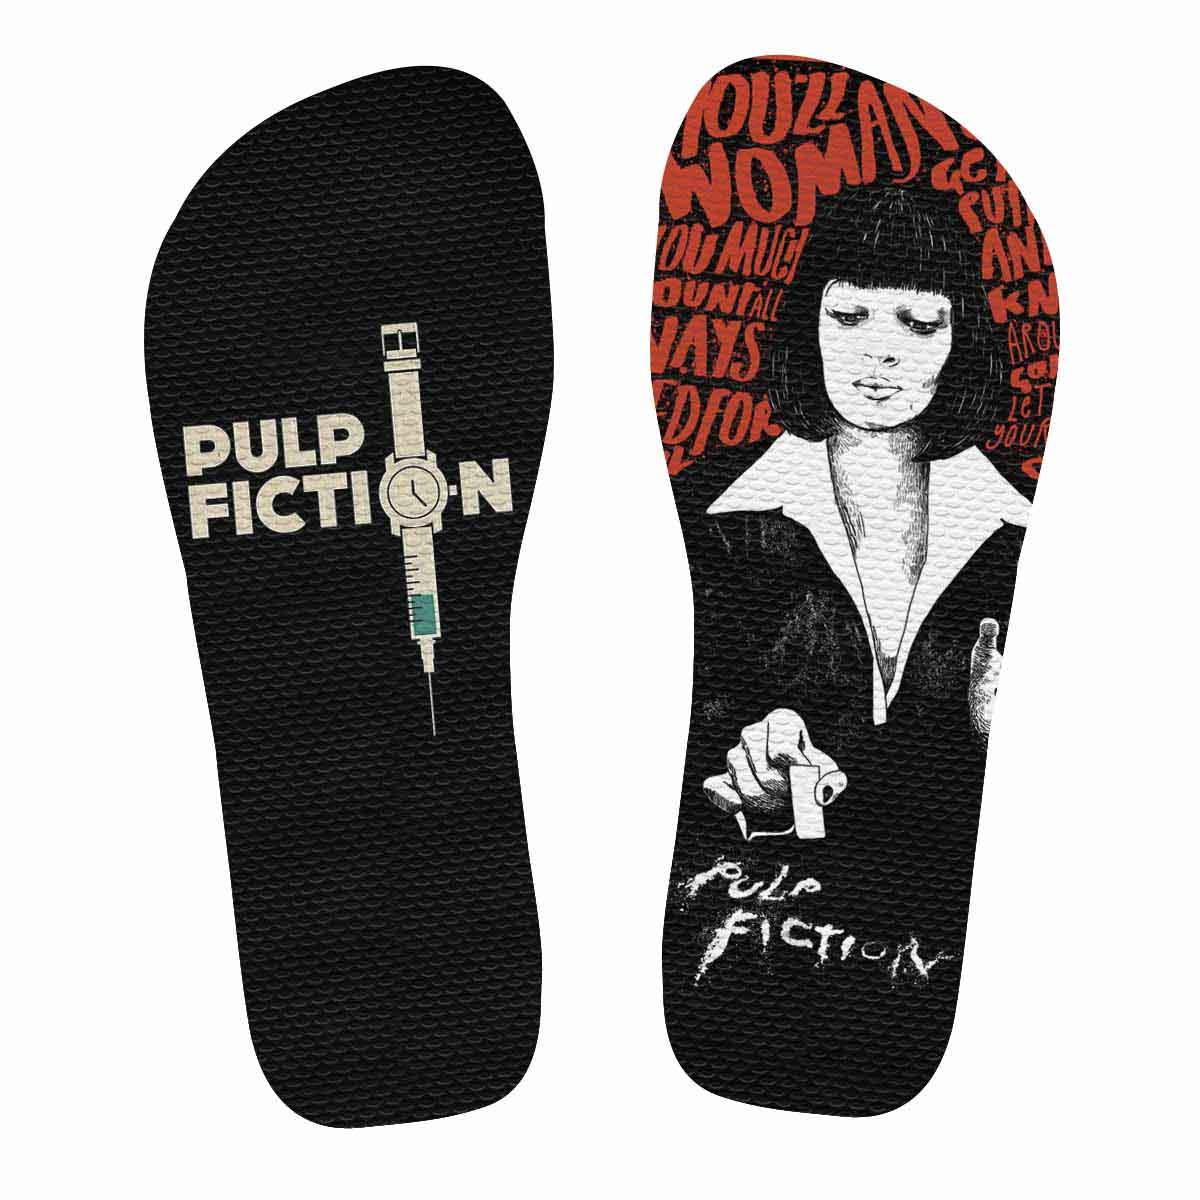 d77bea628 Chinelo Pulp Fiction | Mia Wallace no Elo7 | Rockstickers Presentes ...